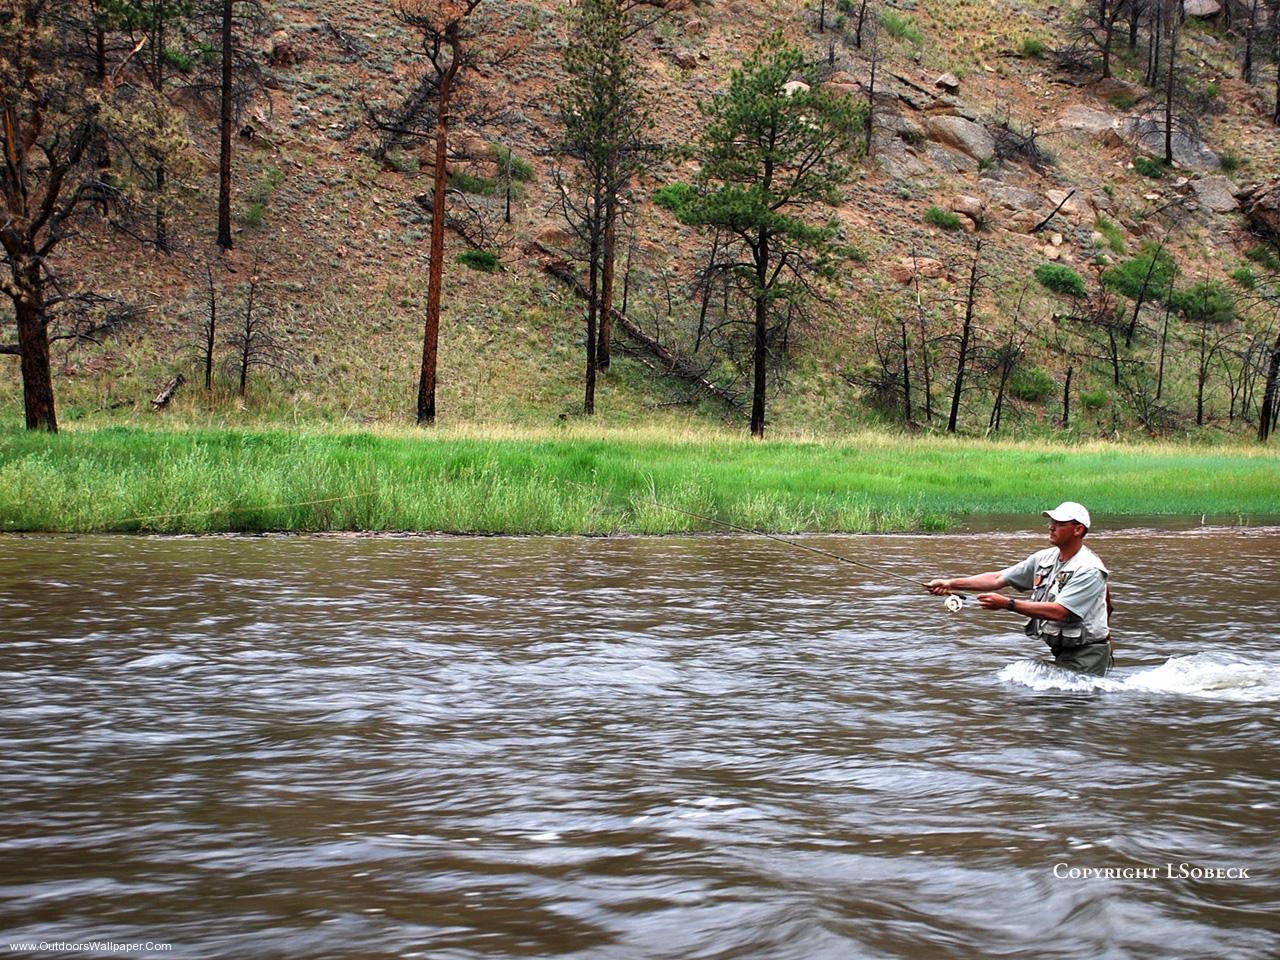 13549_Fishing-South-Platte-4_122_35lo.jpeg